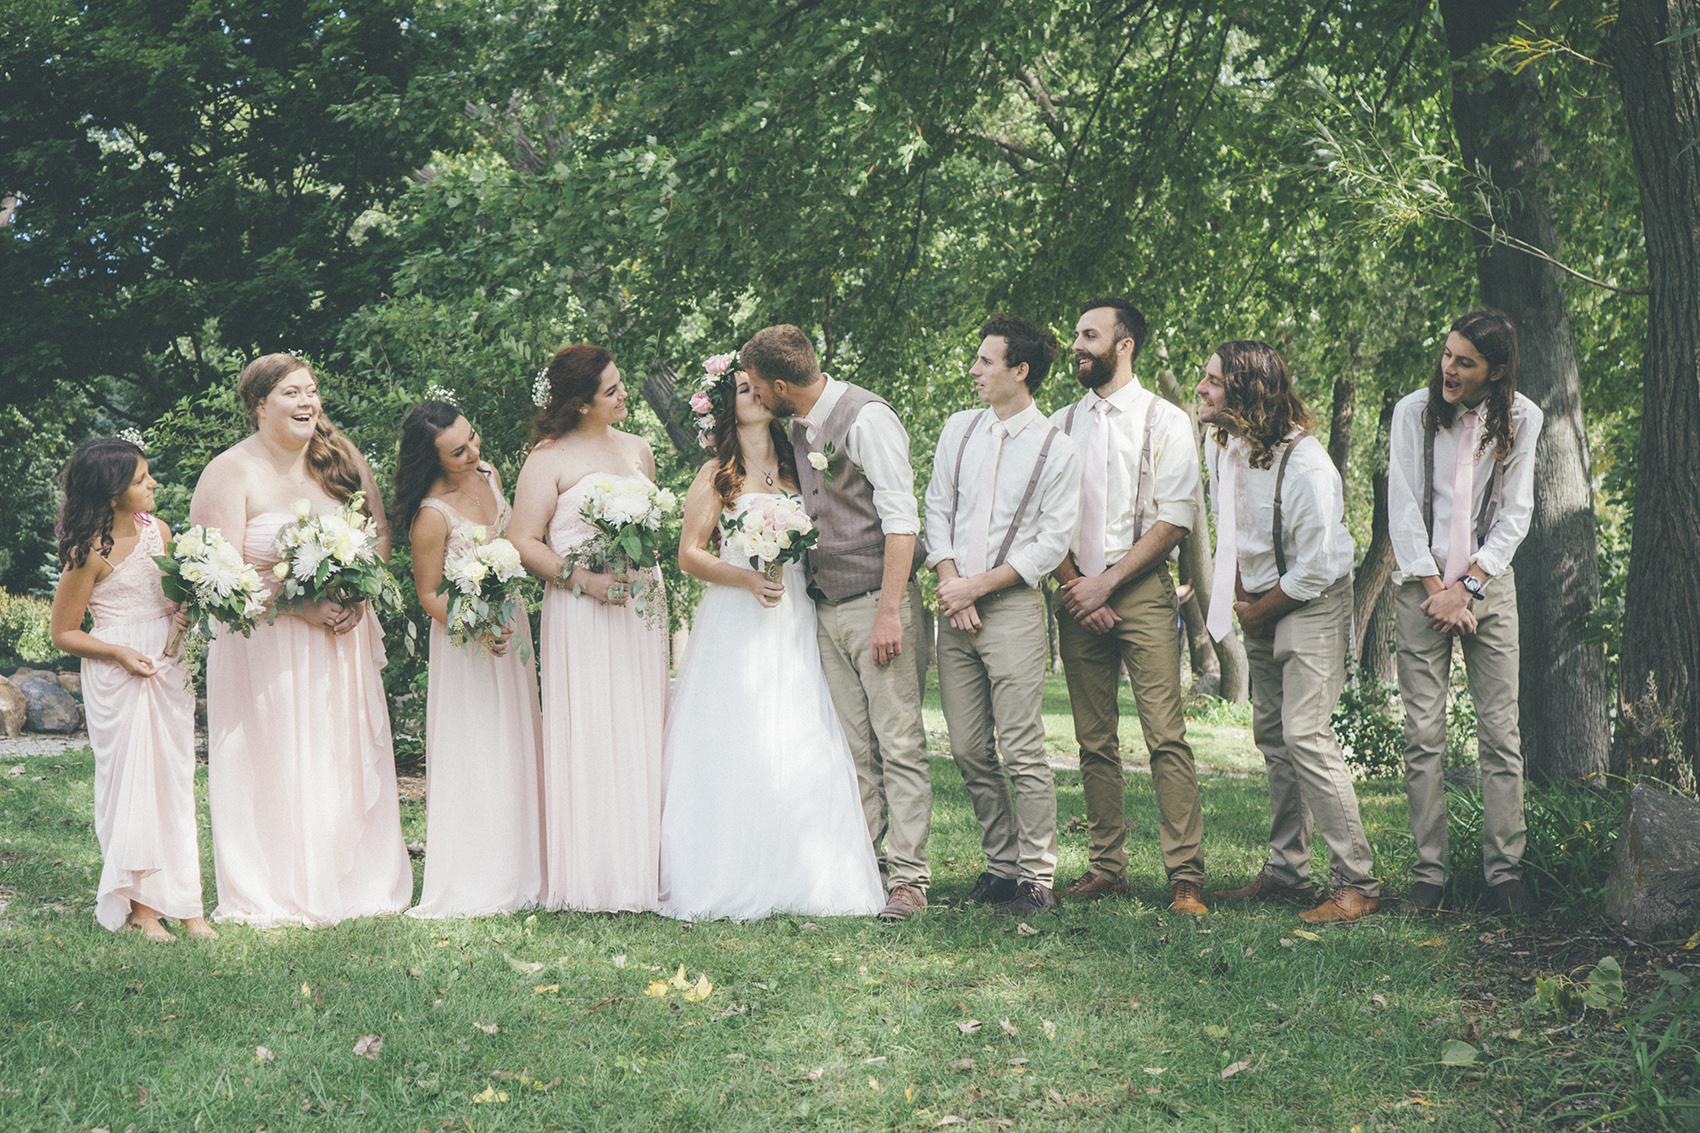 Mike_Mendez_Photography_Wedding_Engagements_5